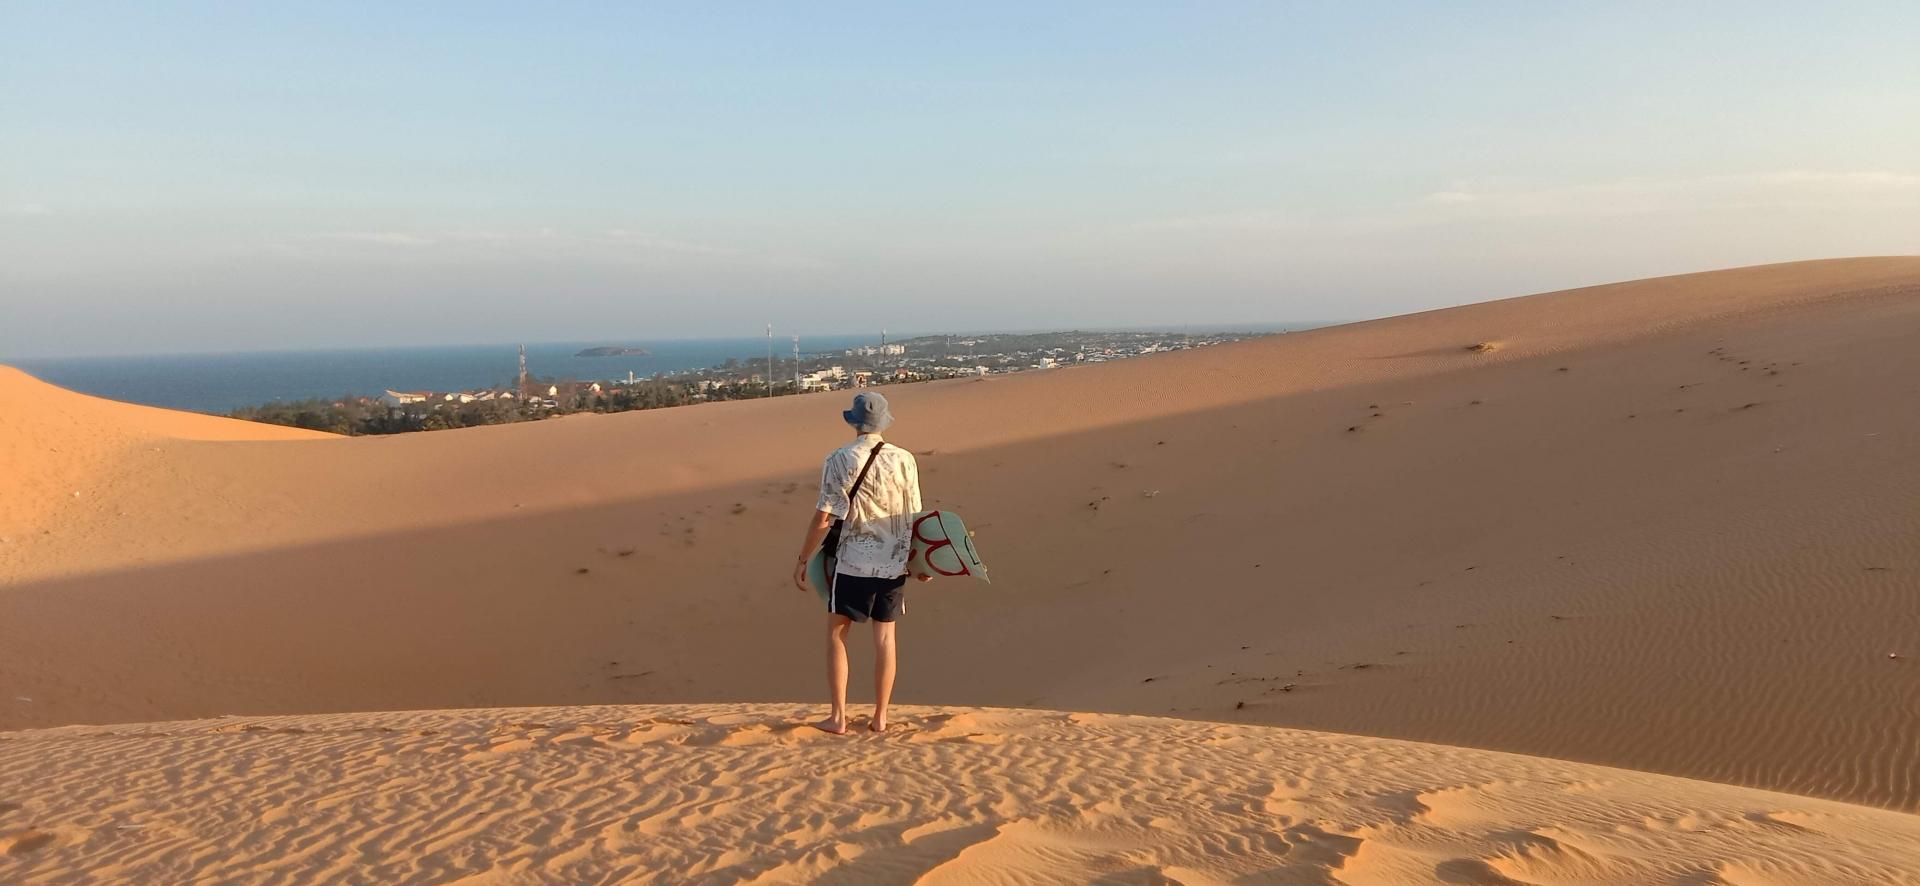 The Artistry Of Mui Ne's Dunes at Sunset